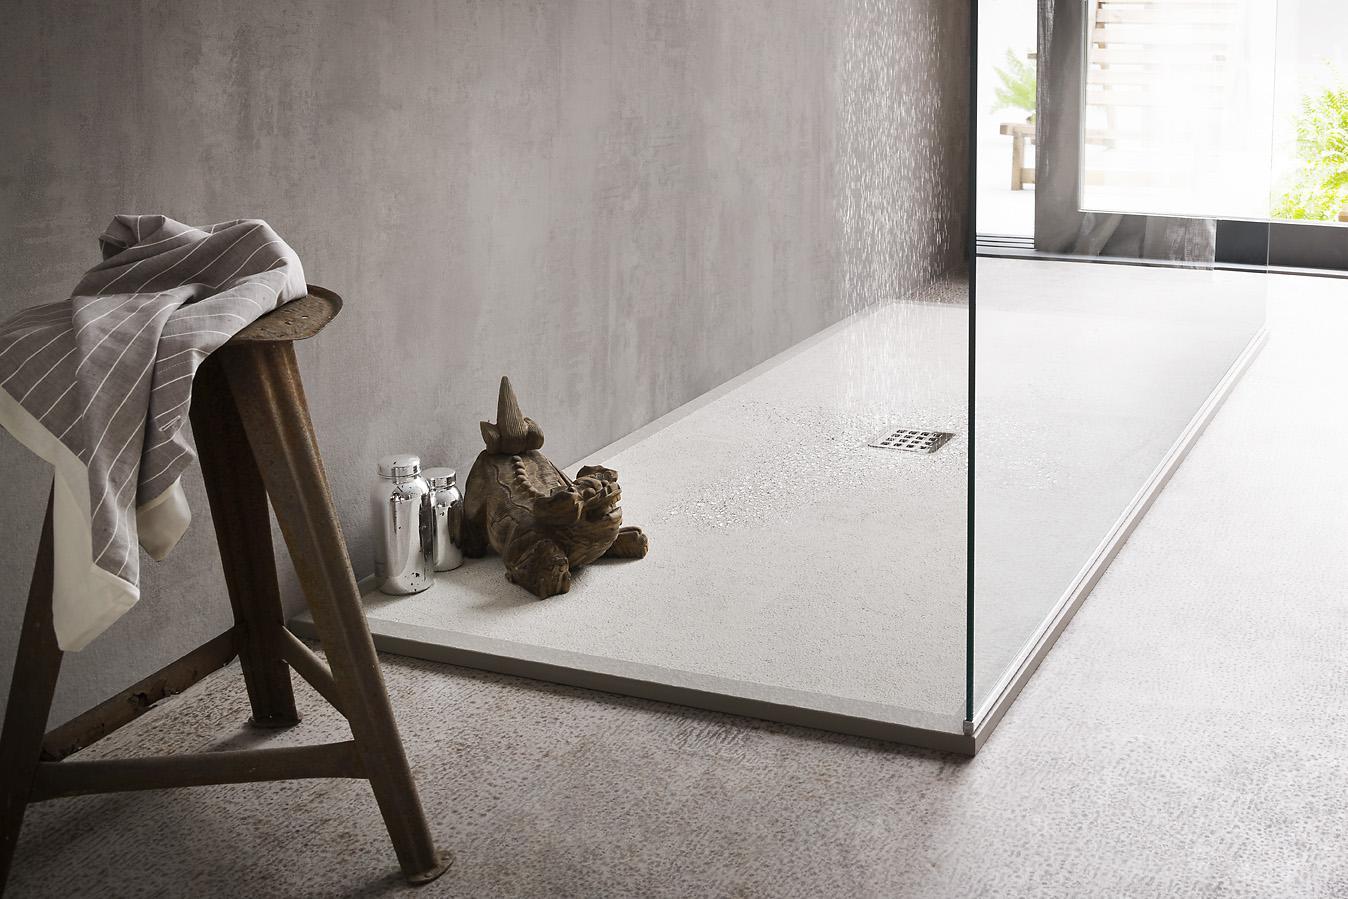 magasin salle de bain grenoble interesting deco with magasin salle de bain grenoble finest. Black Bedroom Furniture Sets. Home Design Ideas